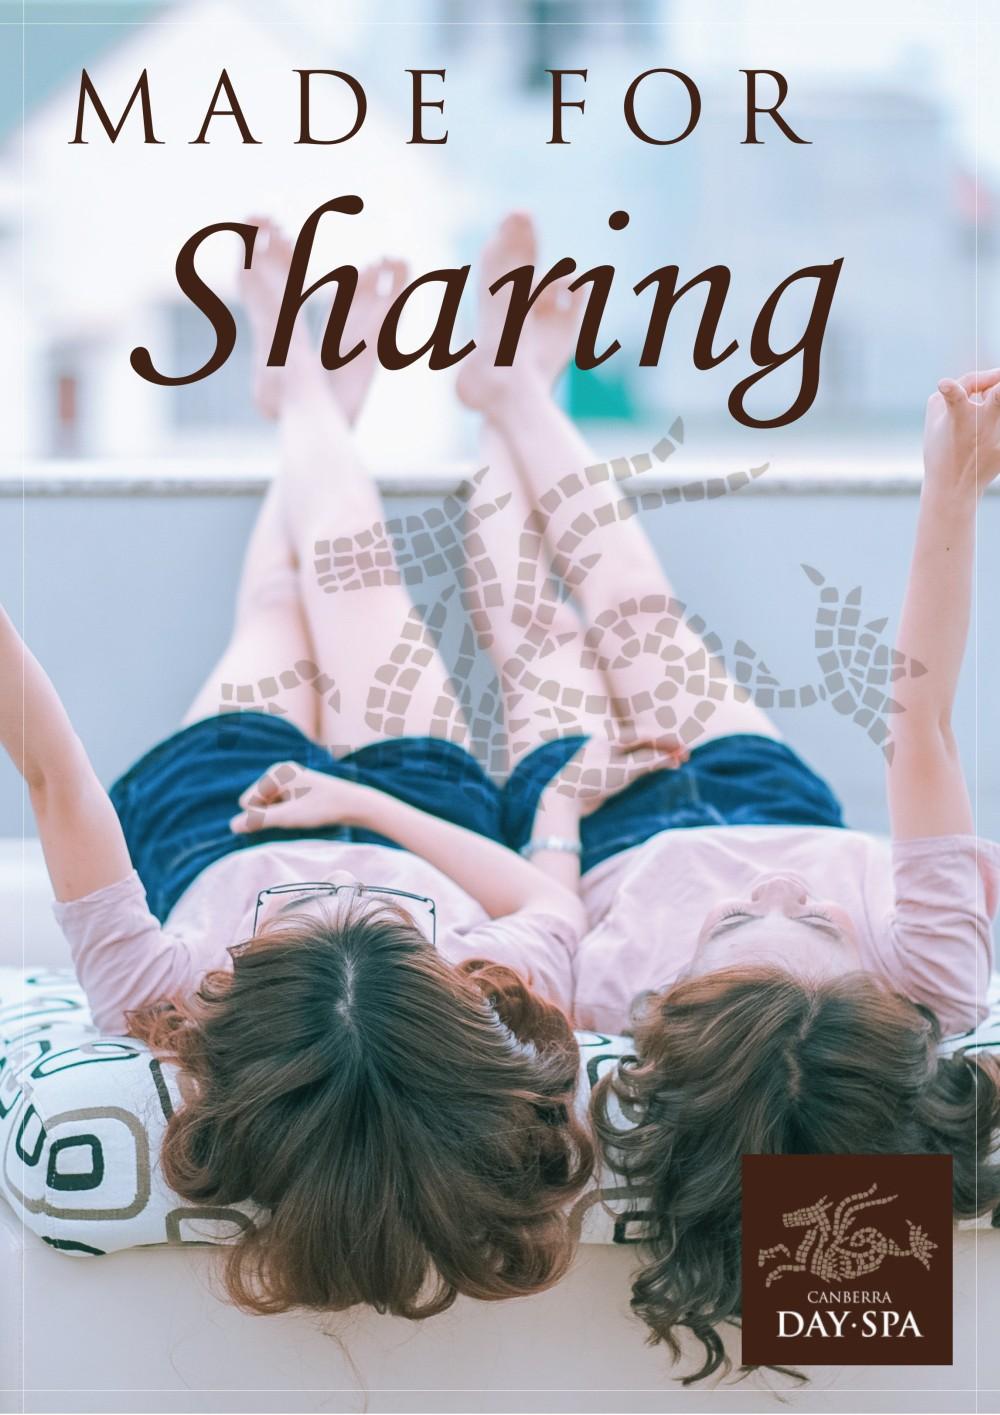 Made_for_sharing_2.jpg